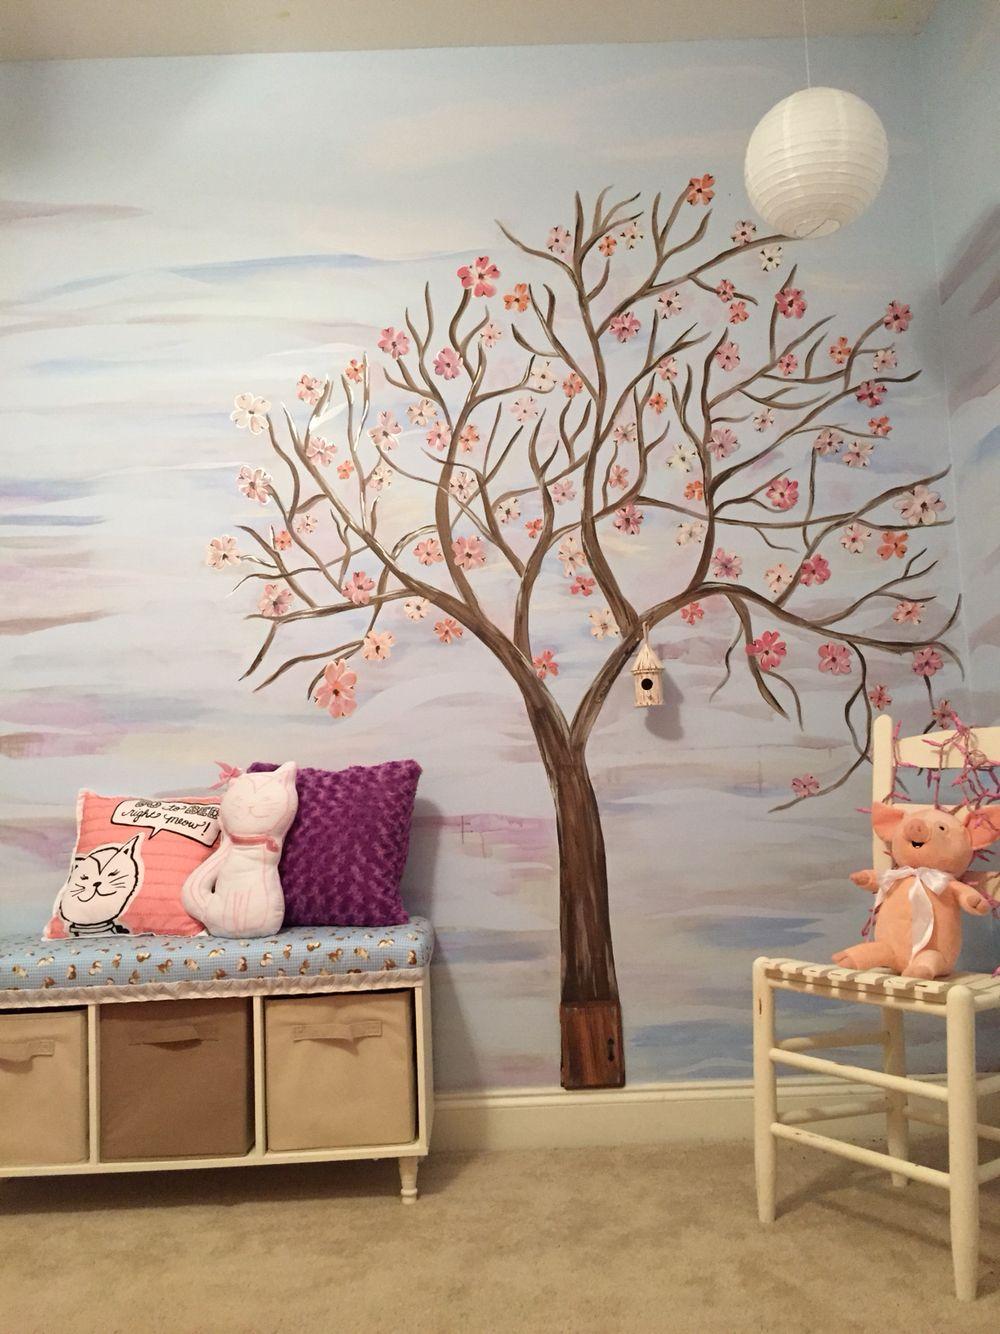 wall art tree mural hand painted tree mural diy bench girls  - wall art tree mural hand painted tree mural diy bench girls room